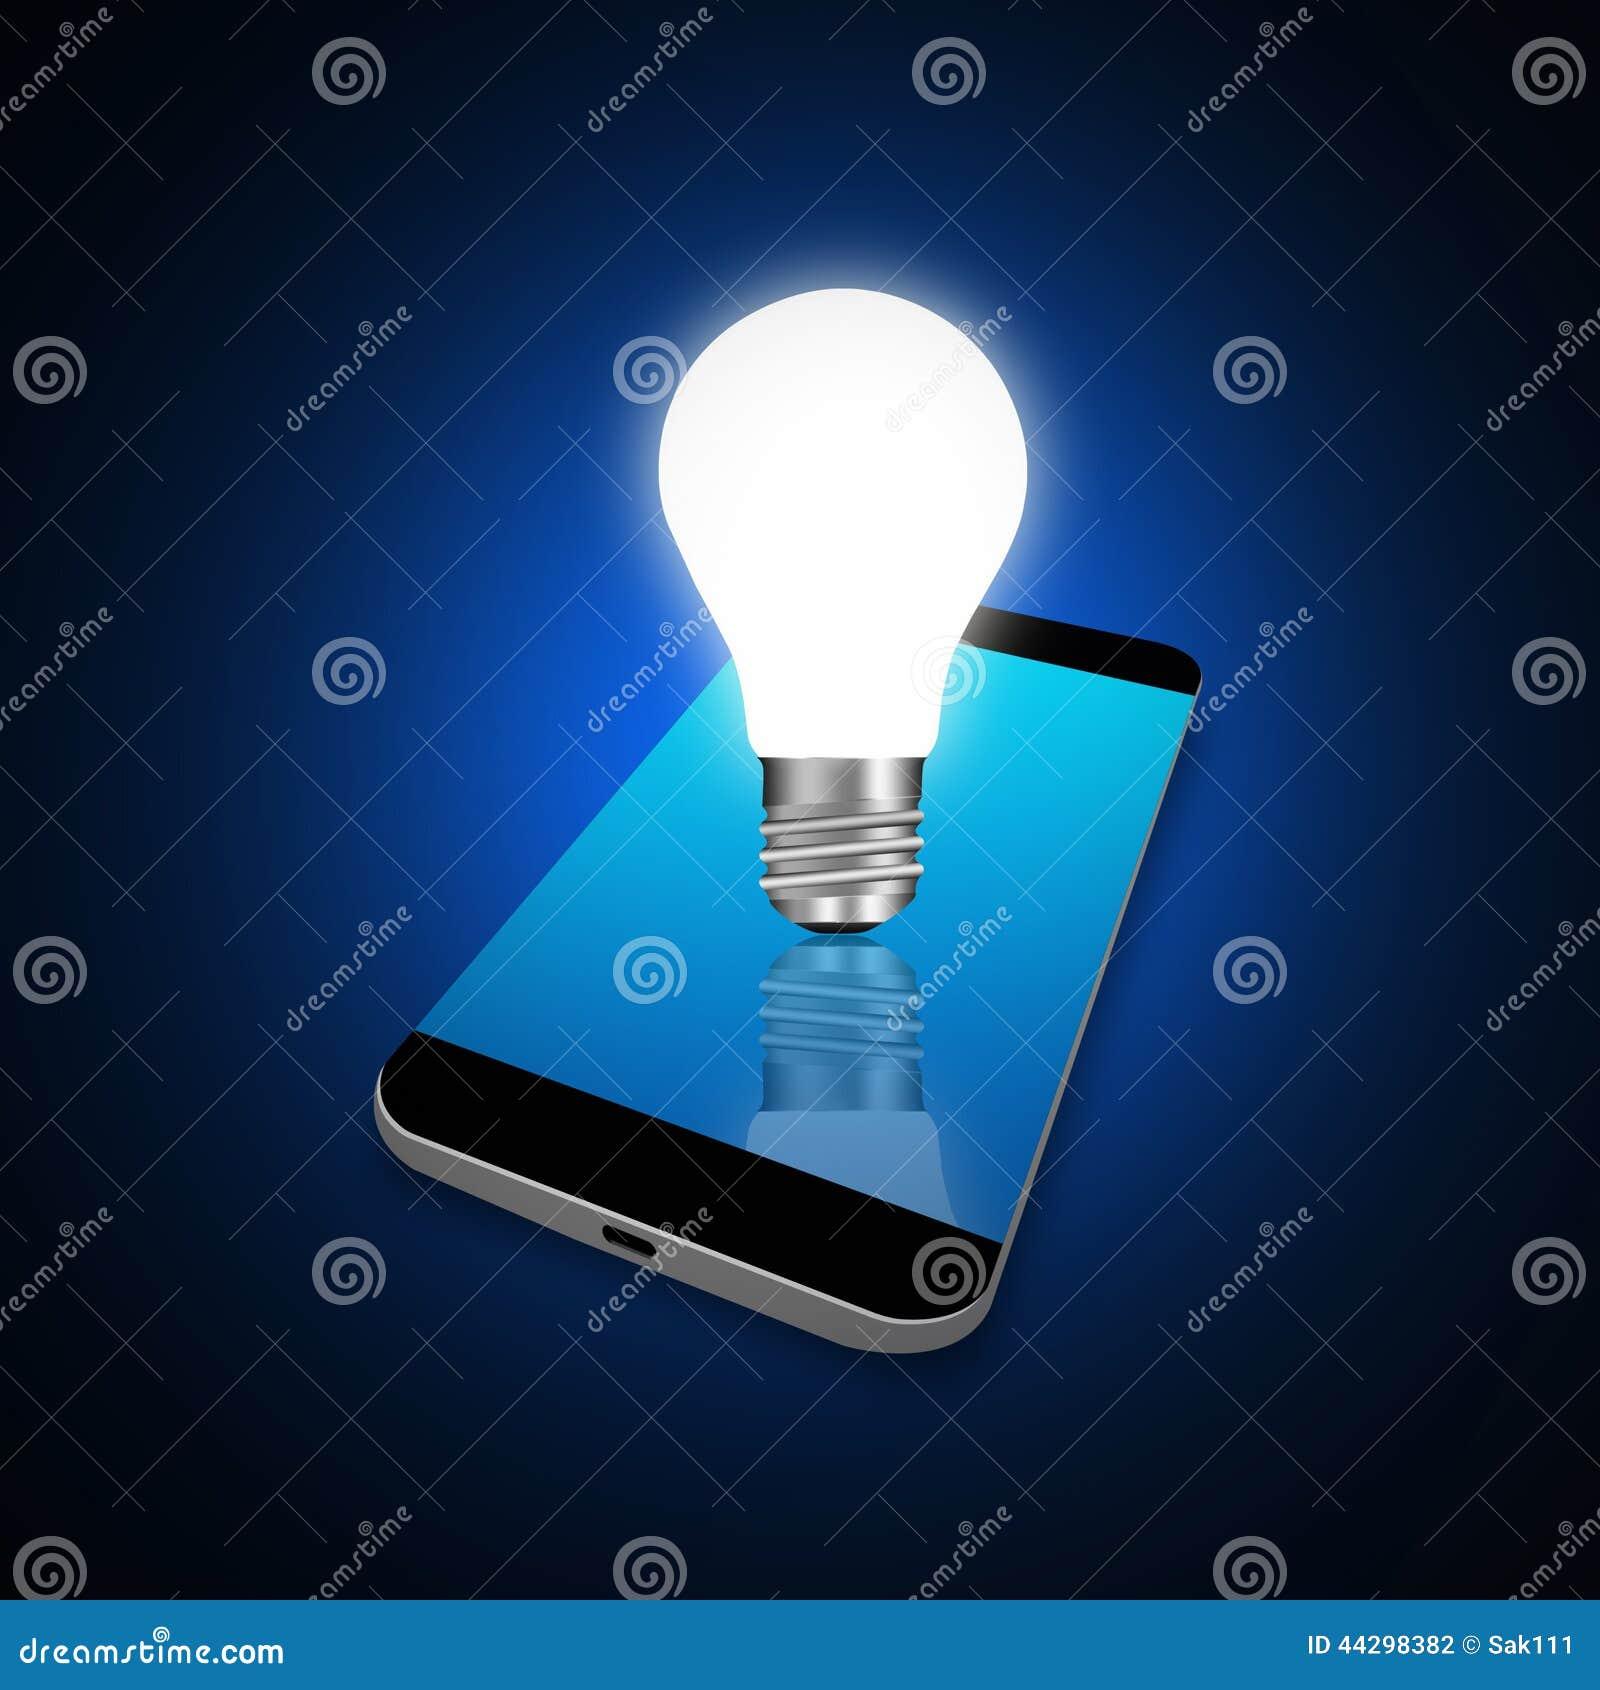 Exploring The Science Of Light 35 Illuminating: CartoonDealer.com #54938430